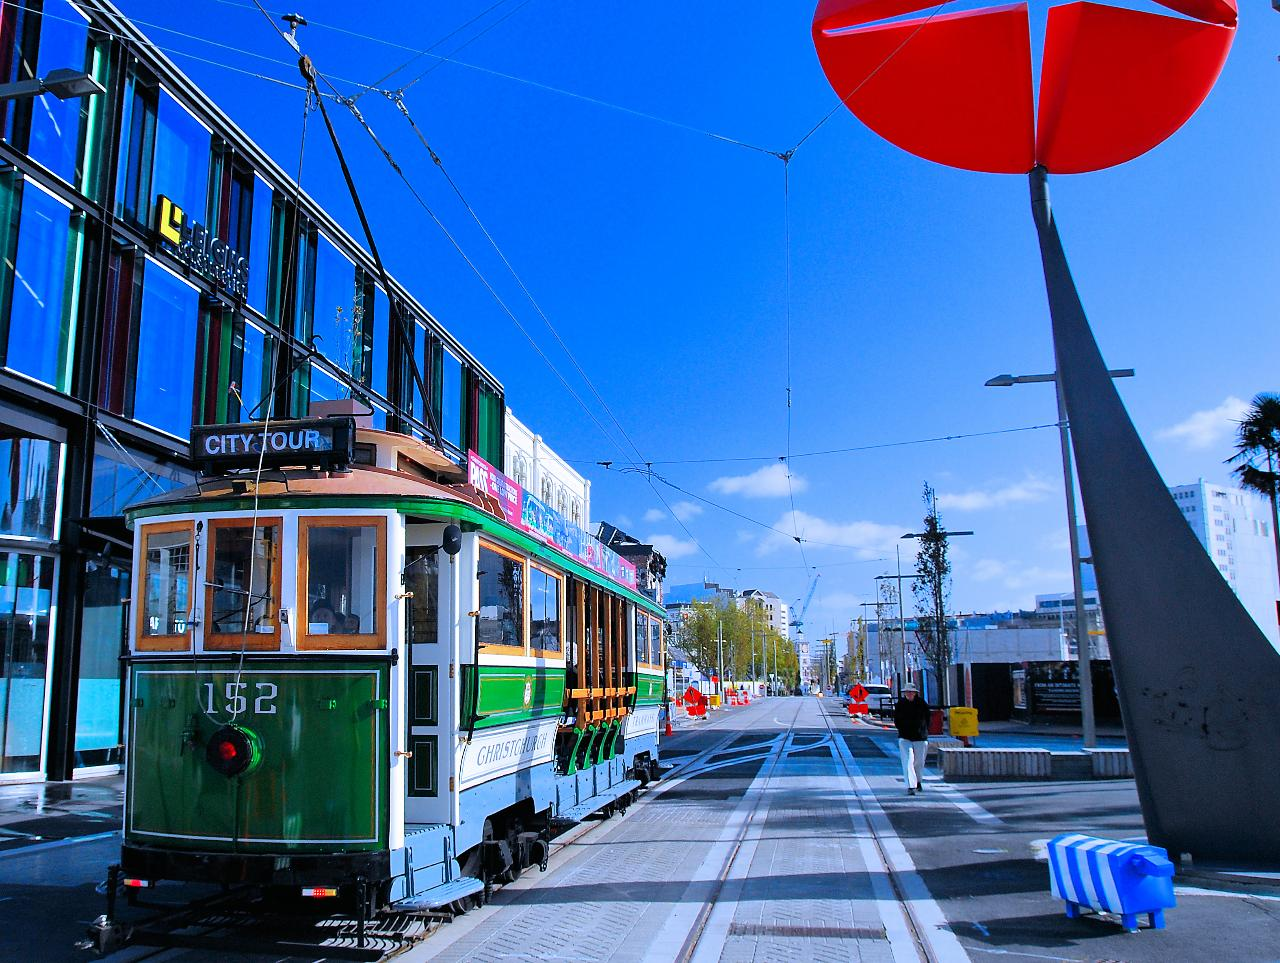 Christchurch Tram City Tour